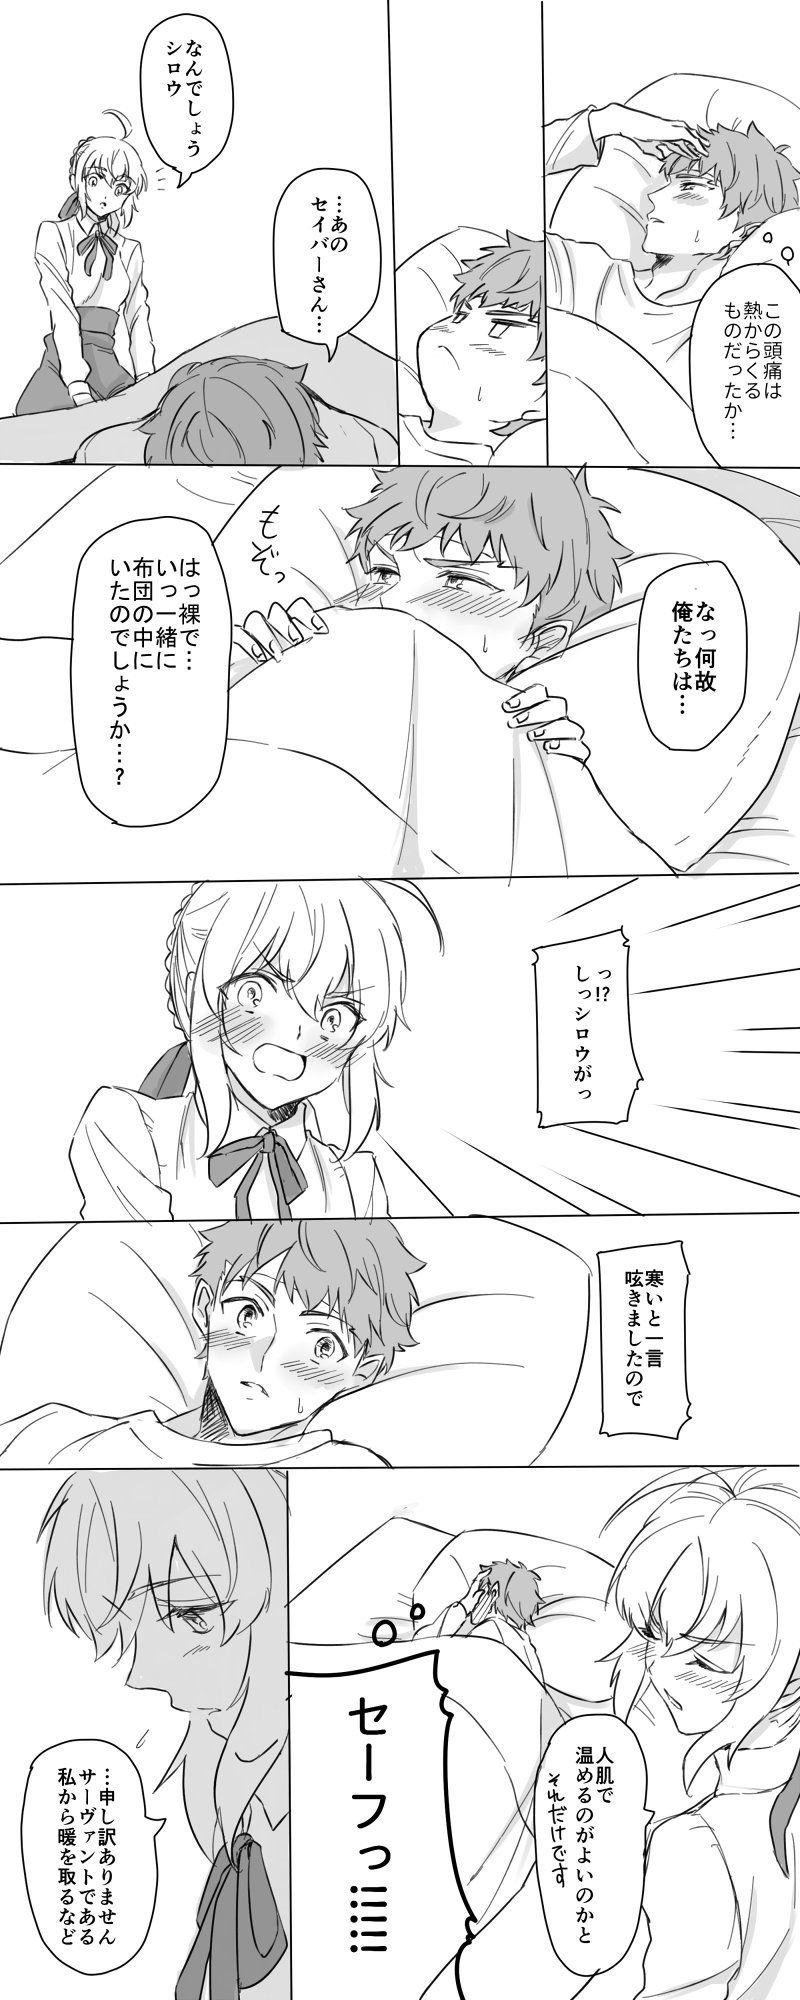 Twitter 漫画 Fate 漫画 Fate 士郎